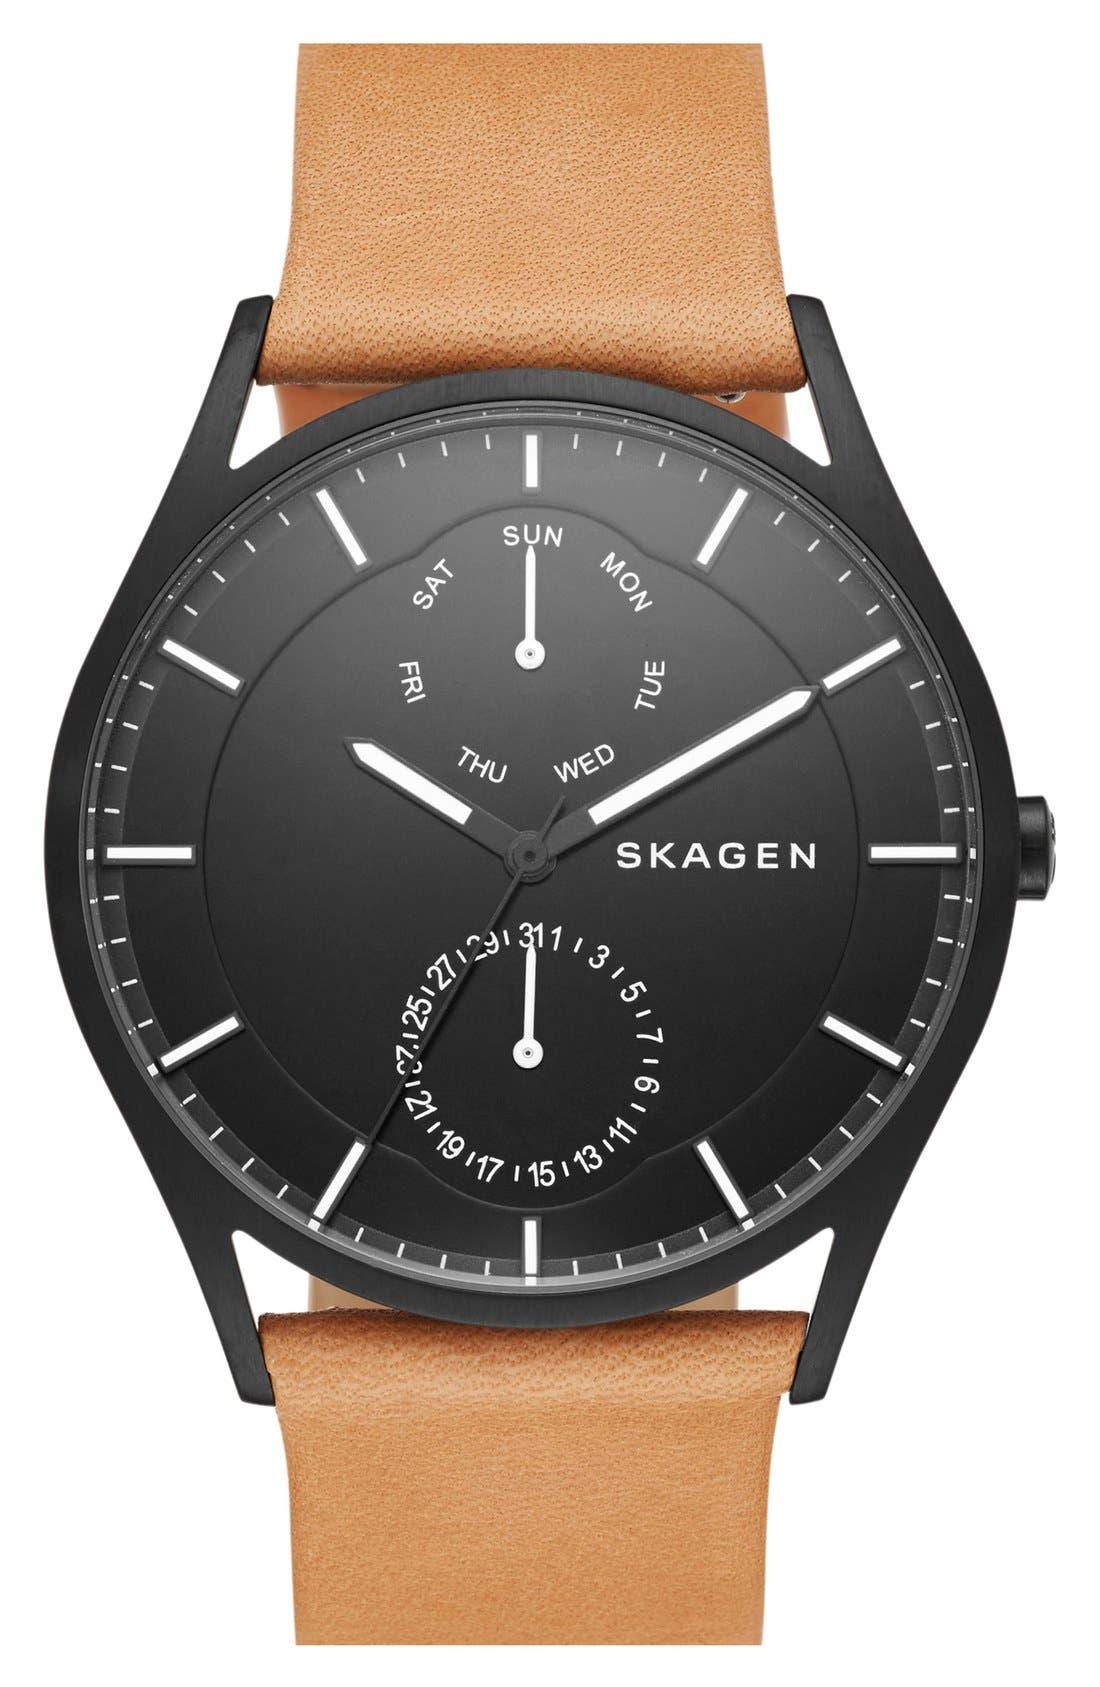 Main Image - Skagen 'Holst' Multifunction Leather Strap Watch, 40mm